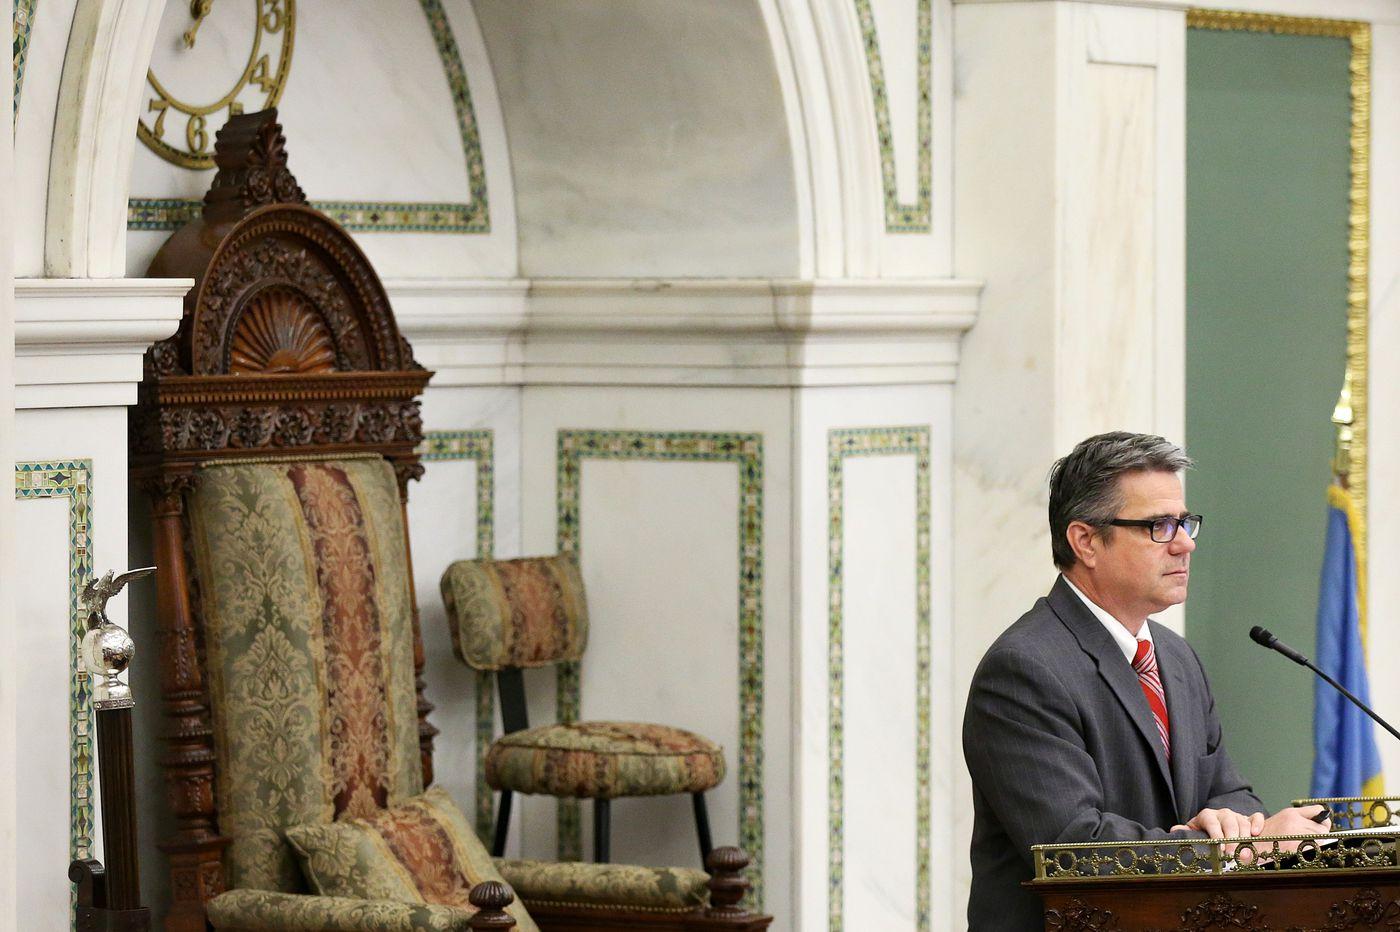 Philadelphia City Councilman Bobby Henon faces a leadership fight as he battles indictment